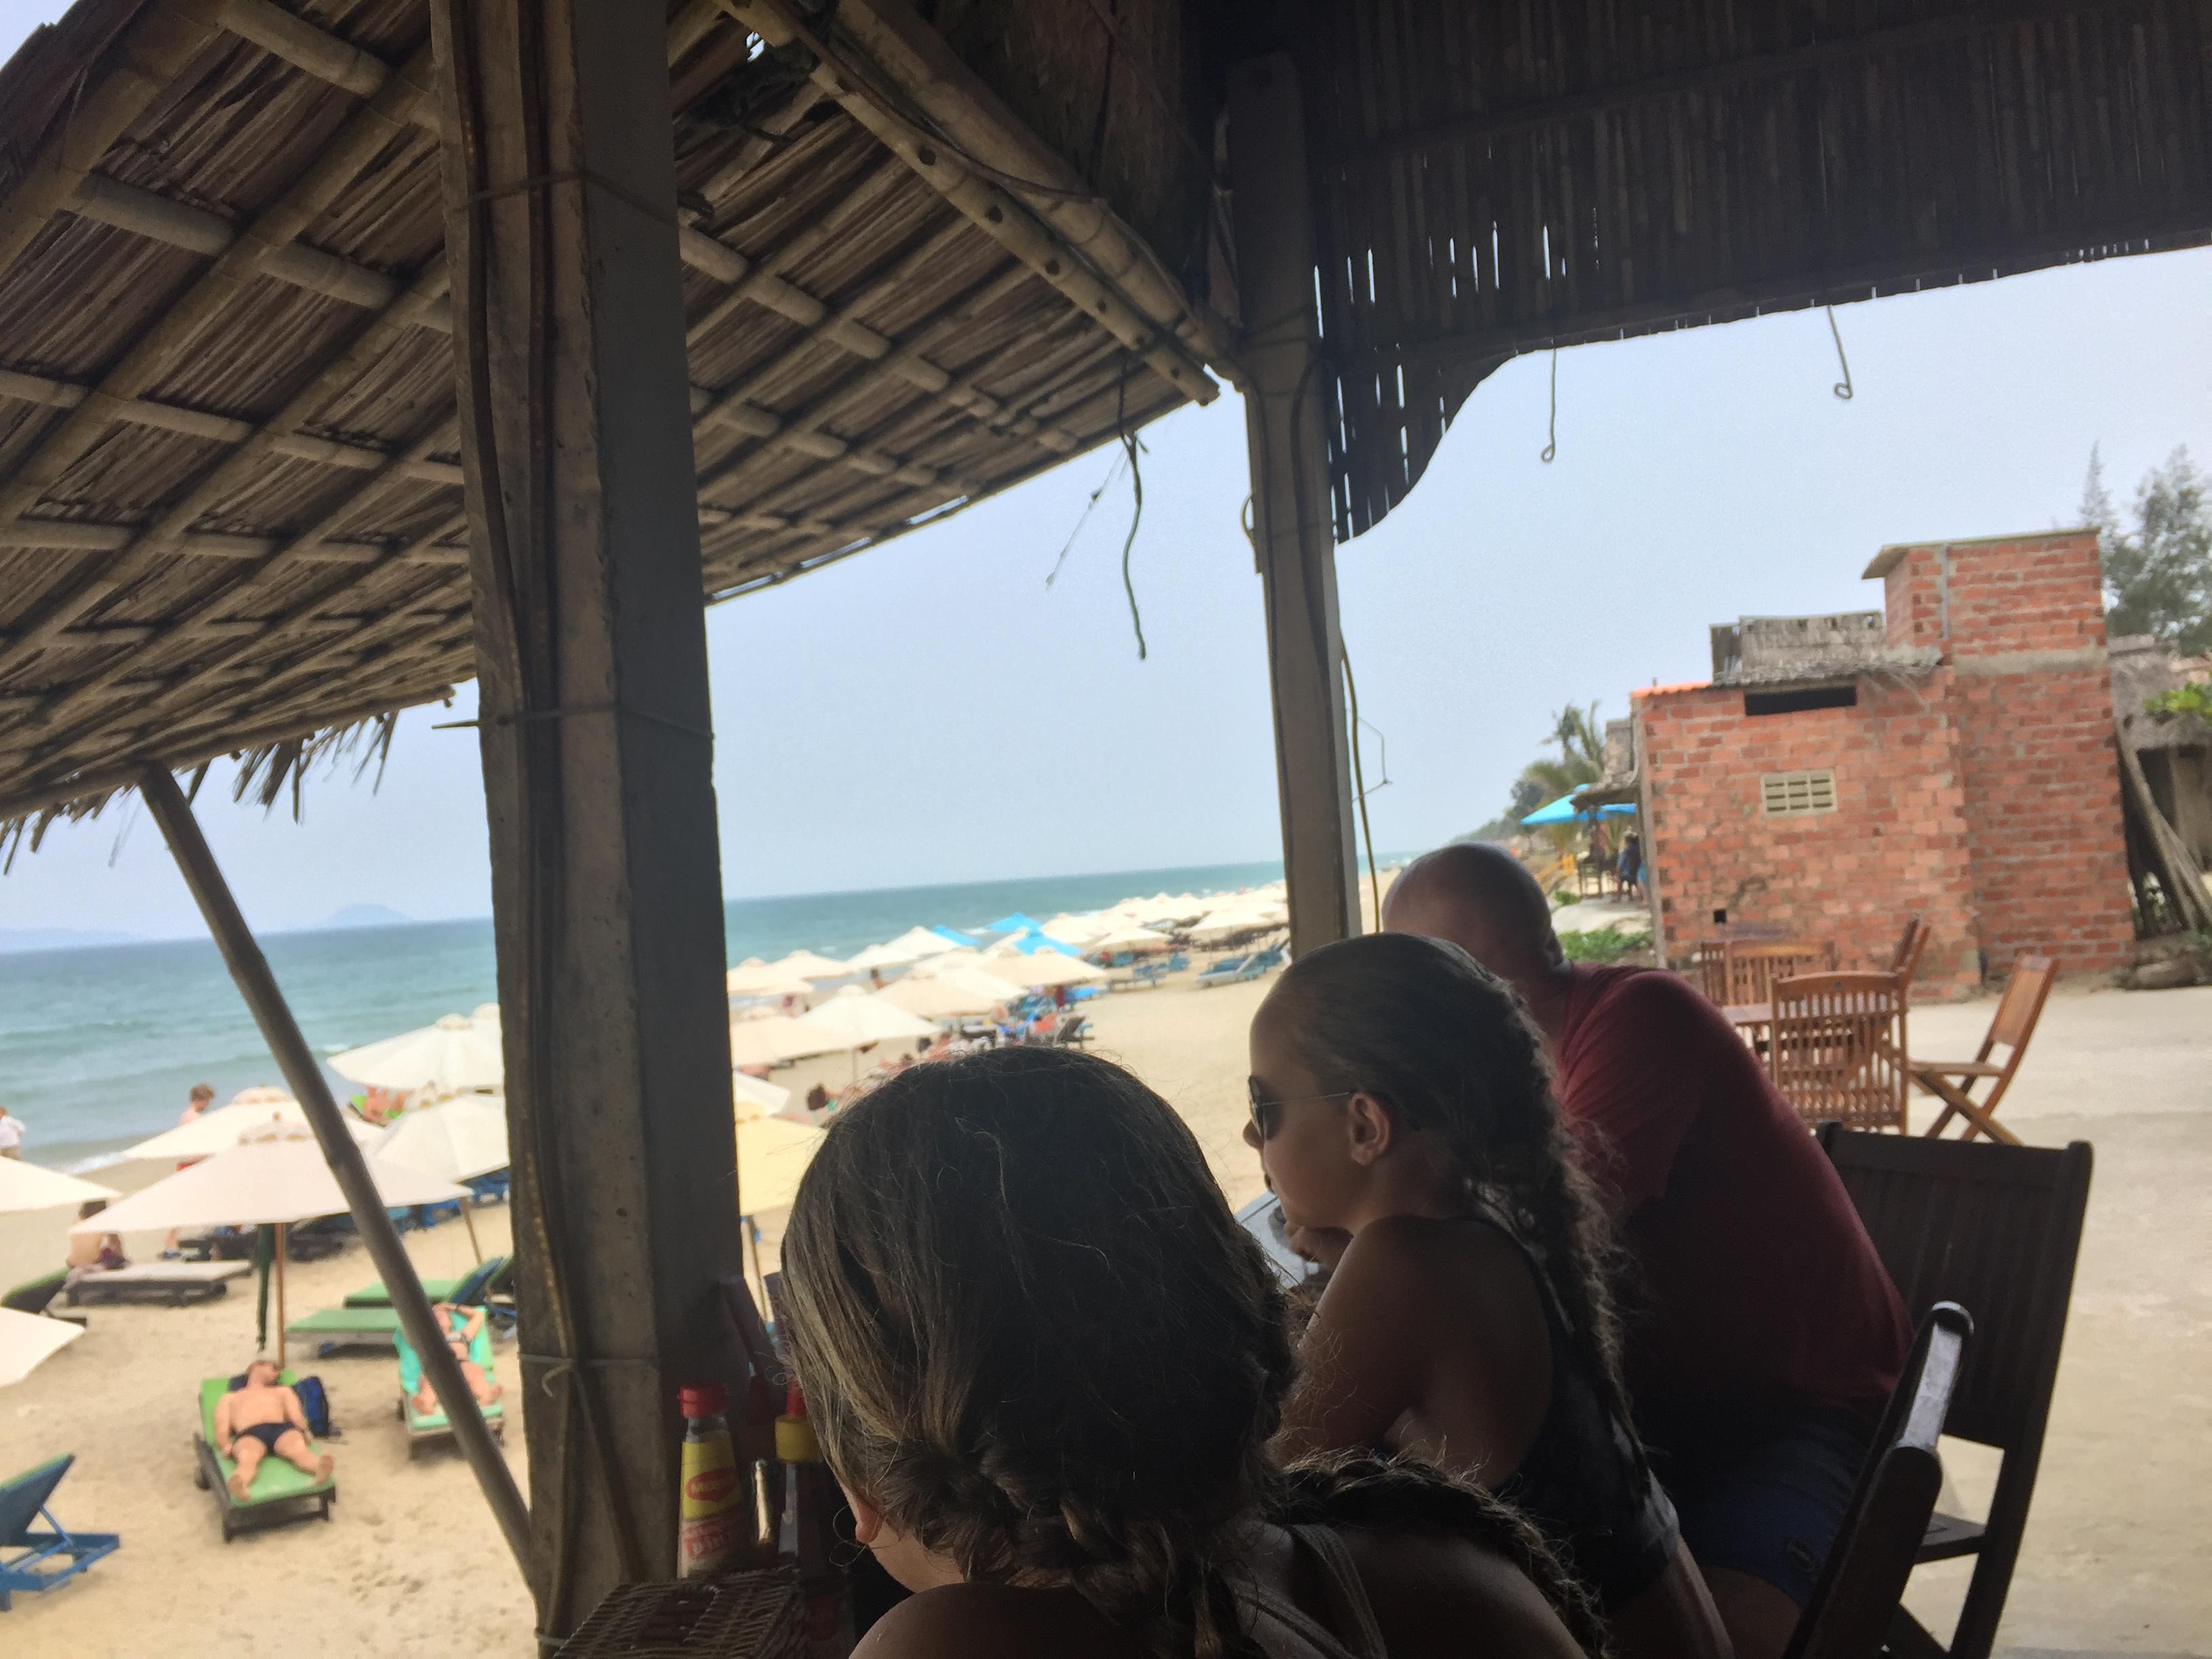 Systematic 200x200cm Beach Mat Magic Sand Free Mat Beach Outdoor Travel Mattress Summer Vacation Camping Plus Size Inflatable Mattress Sports & Entertainment Camping Mat